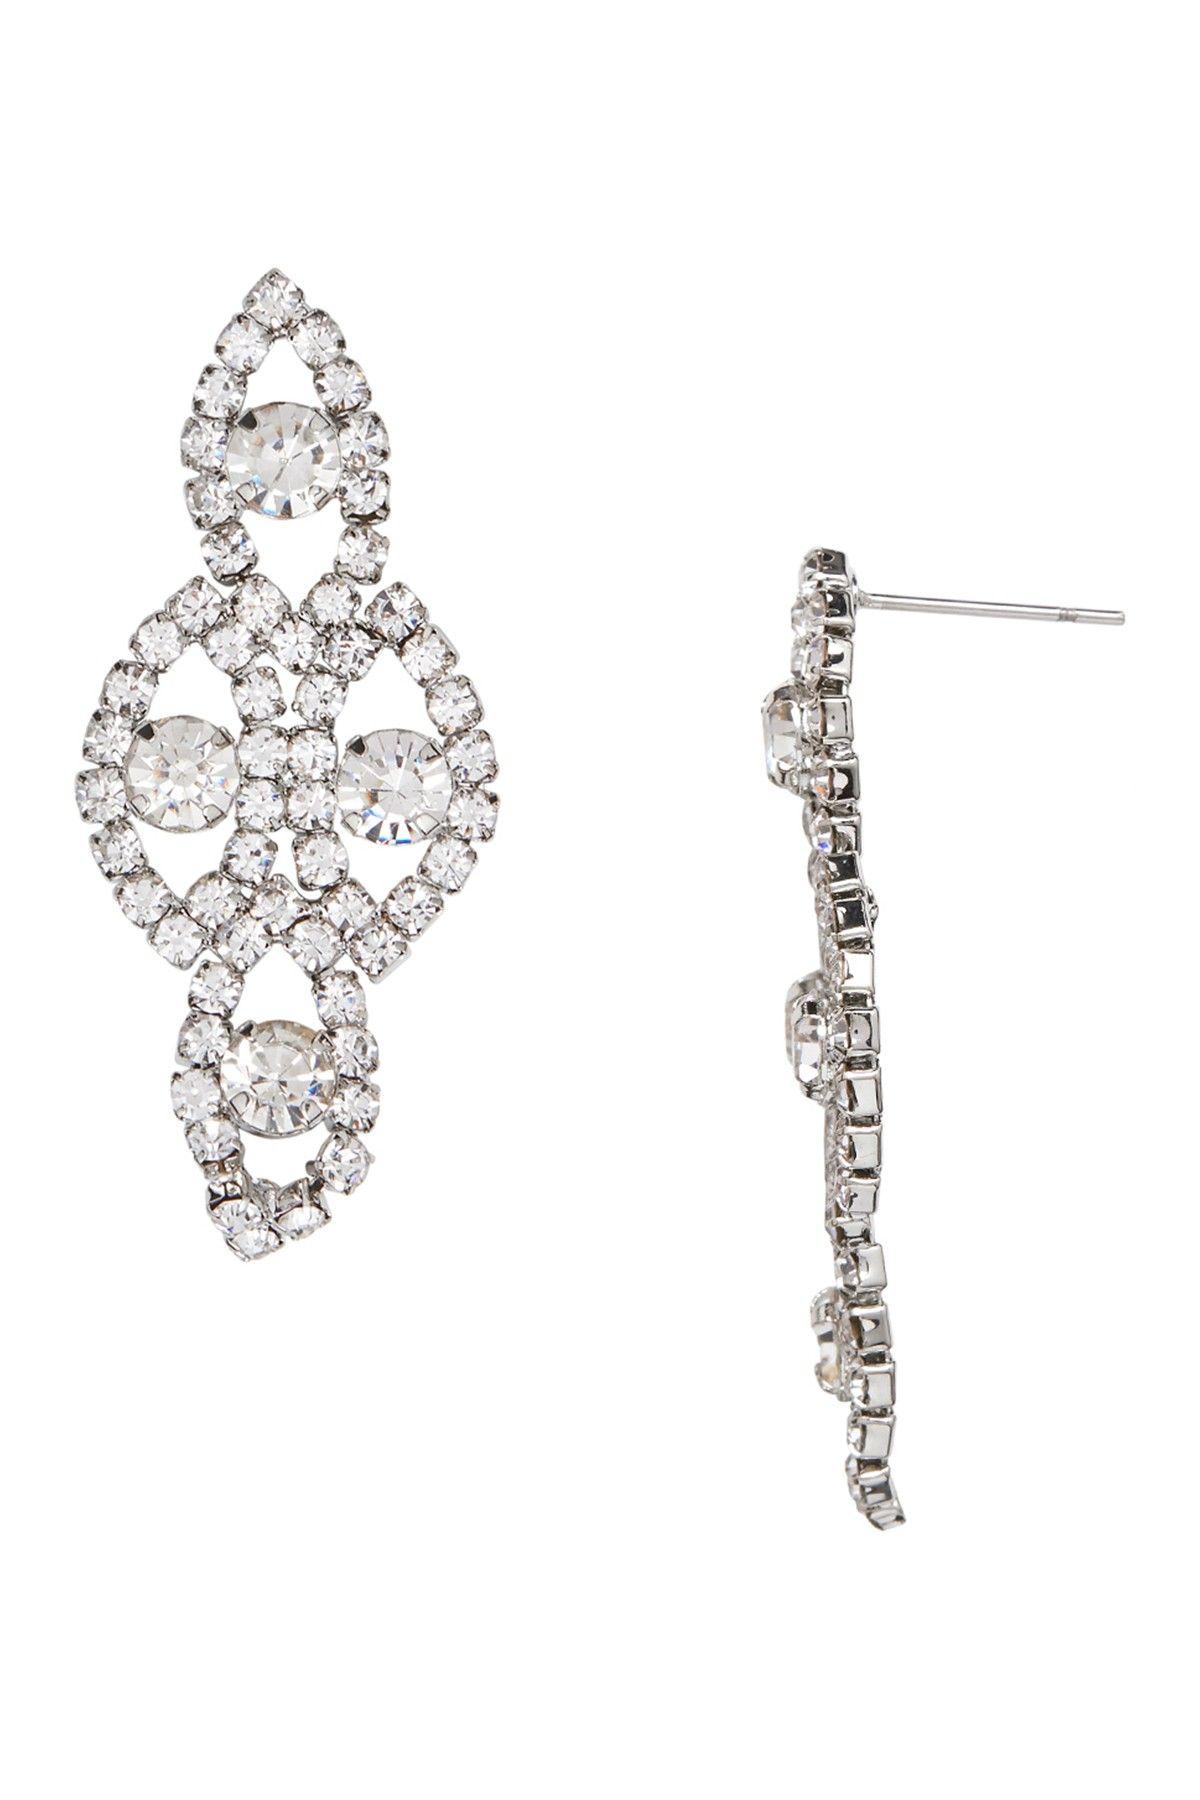 Joe fresh pave crystal chandelier earrings chandelier earrings joe fresh pave crystal chandelier earrings nordstrom rack arubaitofo Choice Image